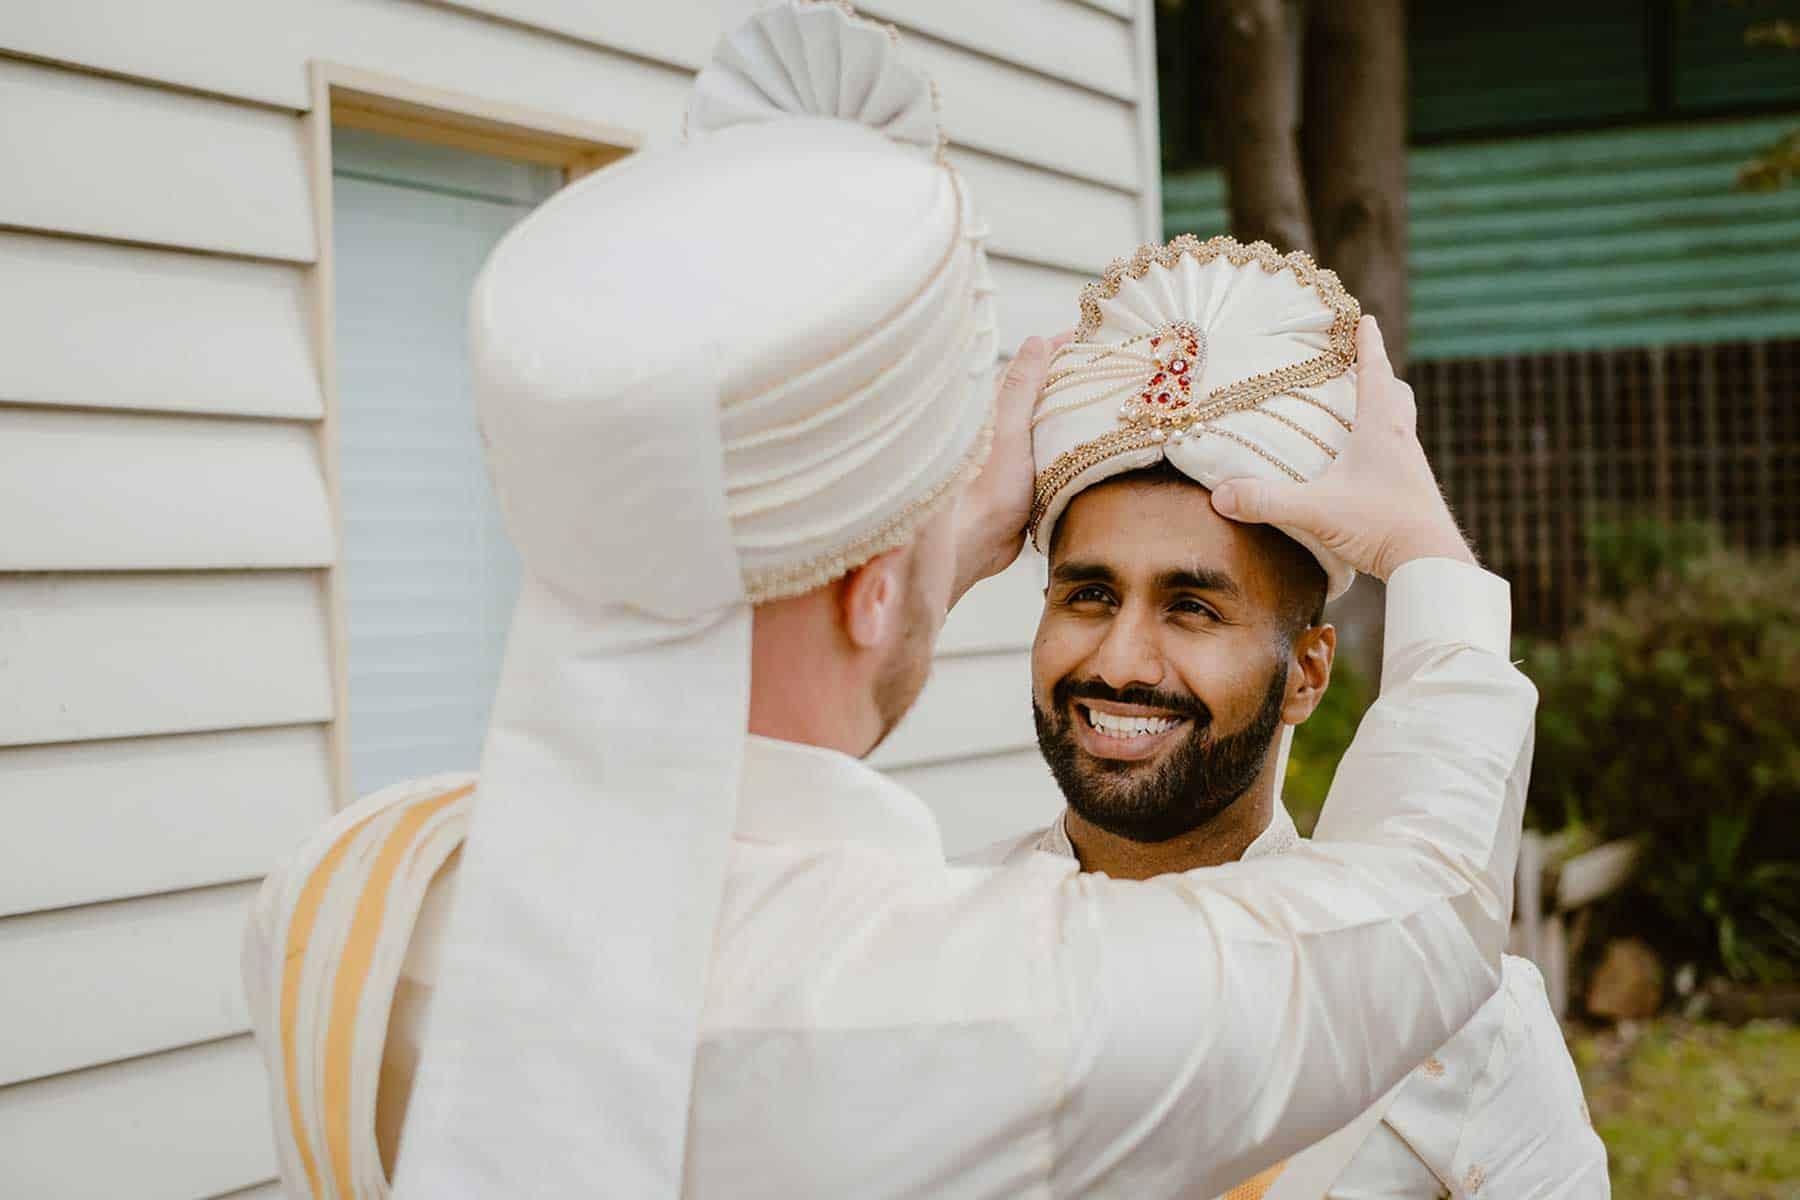 Modern Sri Lankan / Australian wedding inthe Yarra Valley